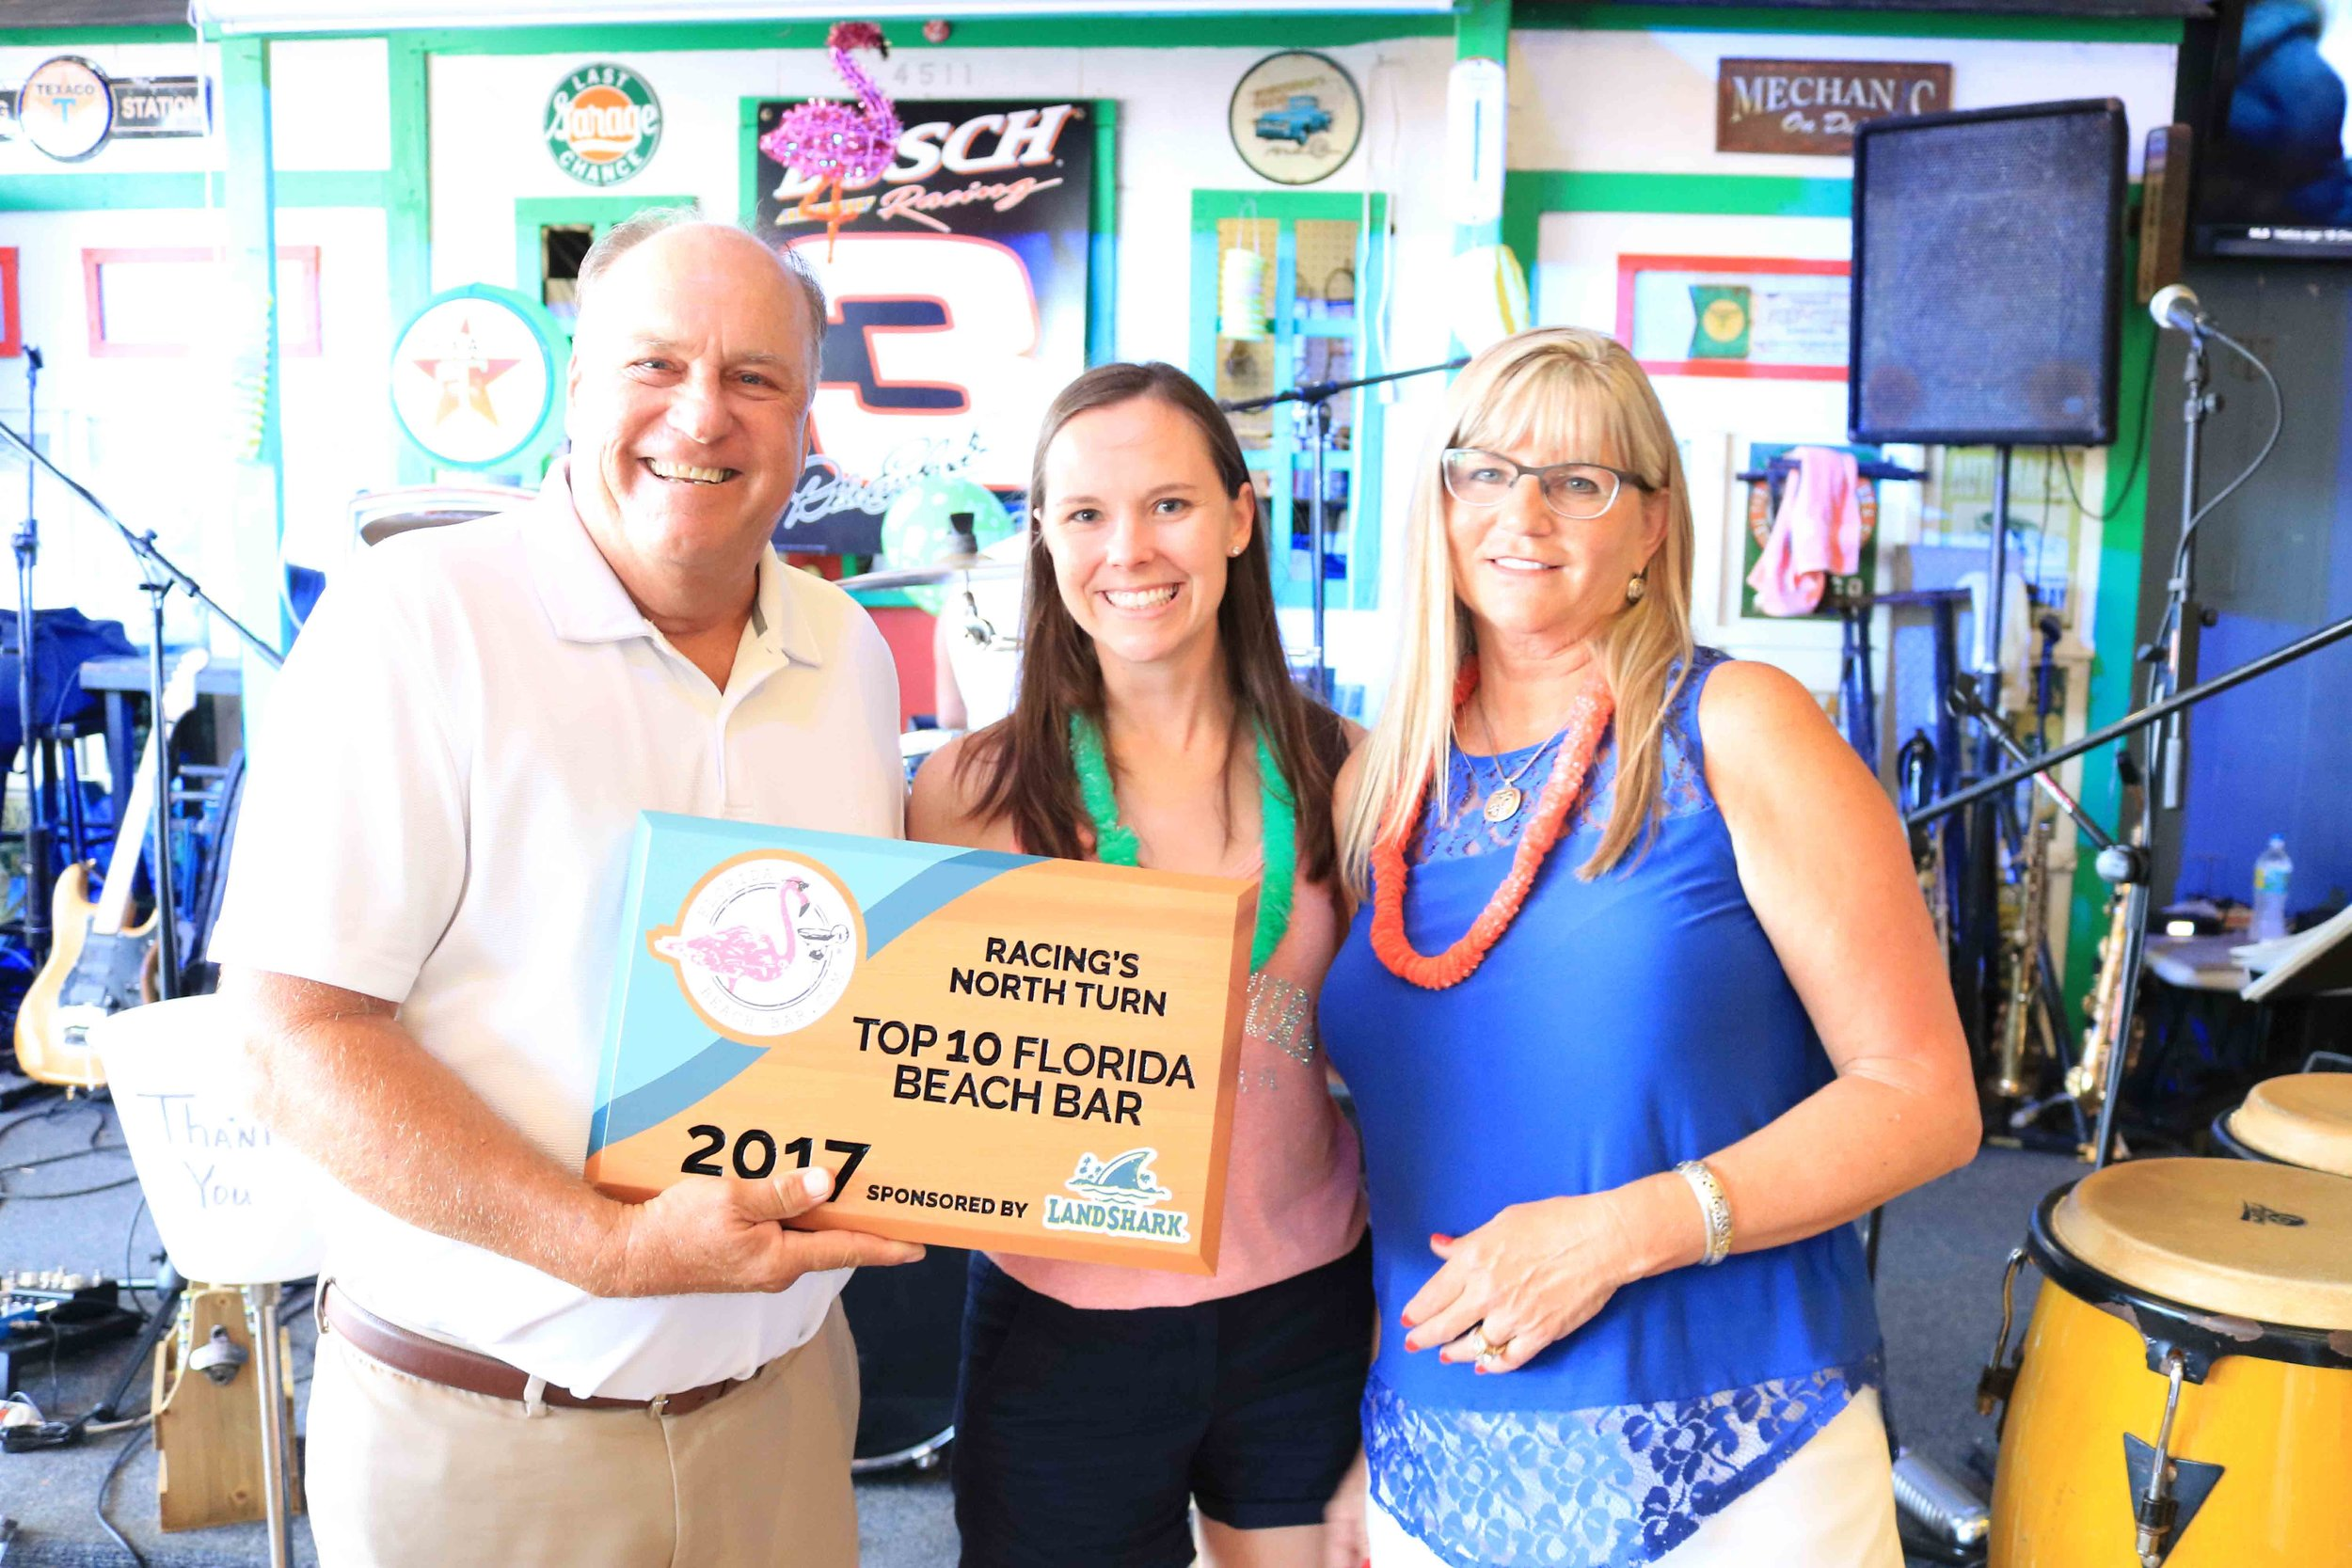 Racing's North Turn Owners, Walt and Rhonda, accept the 2017 Top 10 Florida Beach Bar award